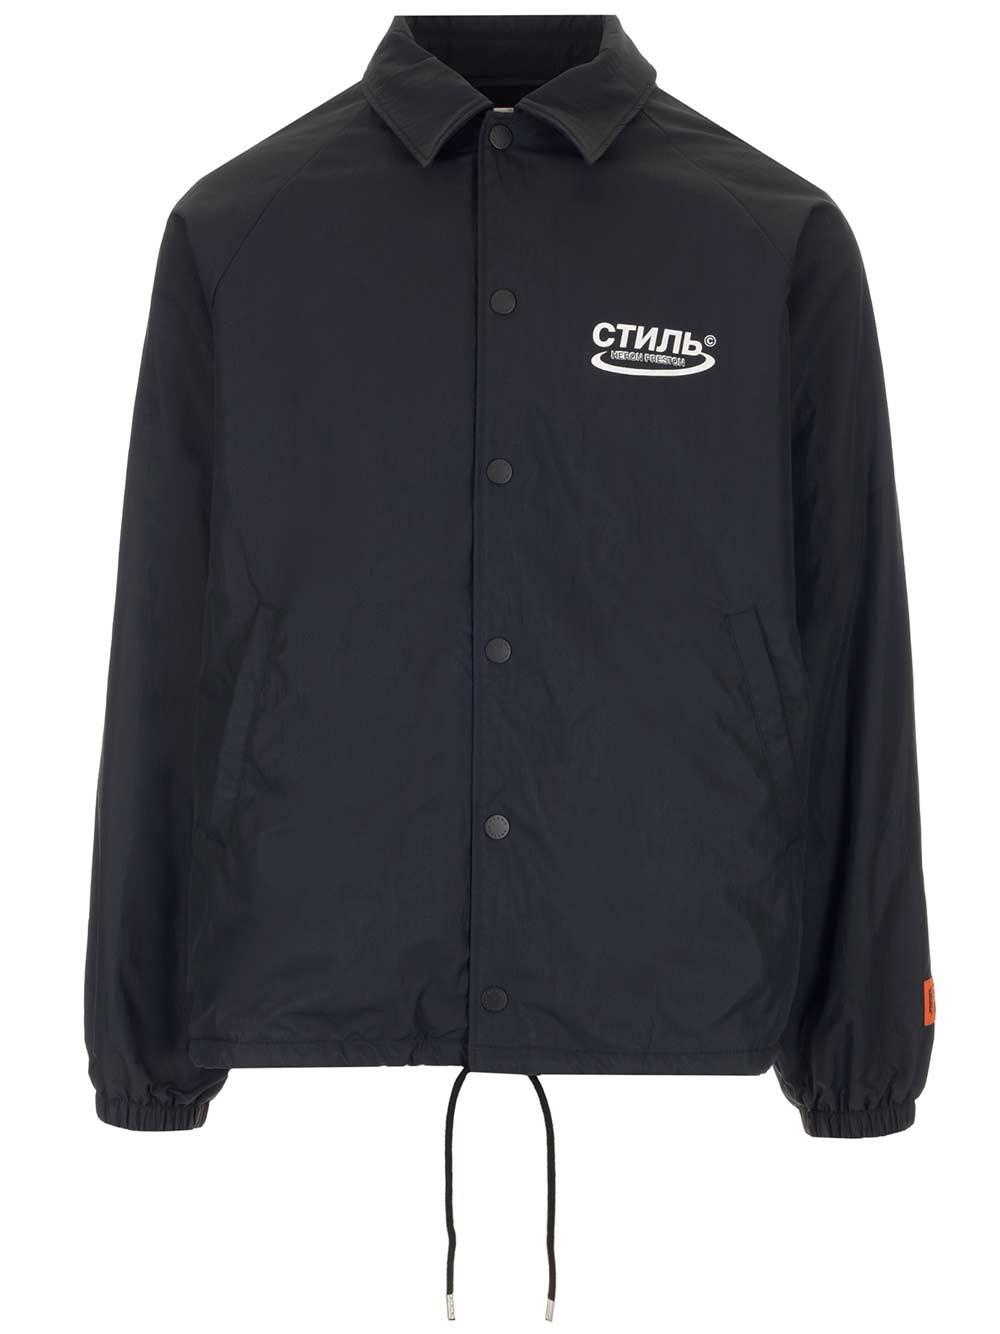 HERON PRESTON Black Coach Ctnmb Jacket